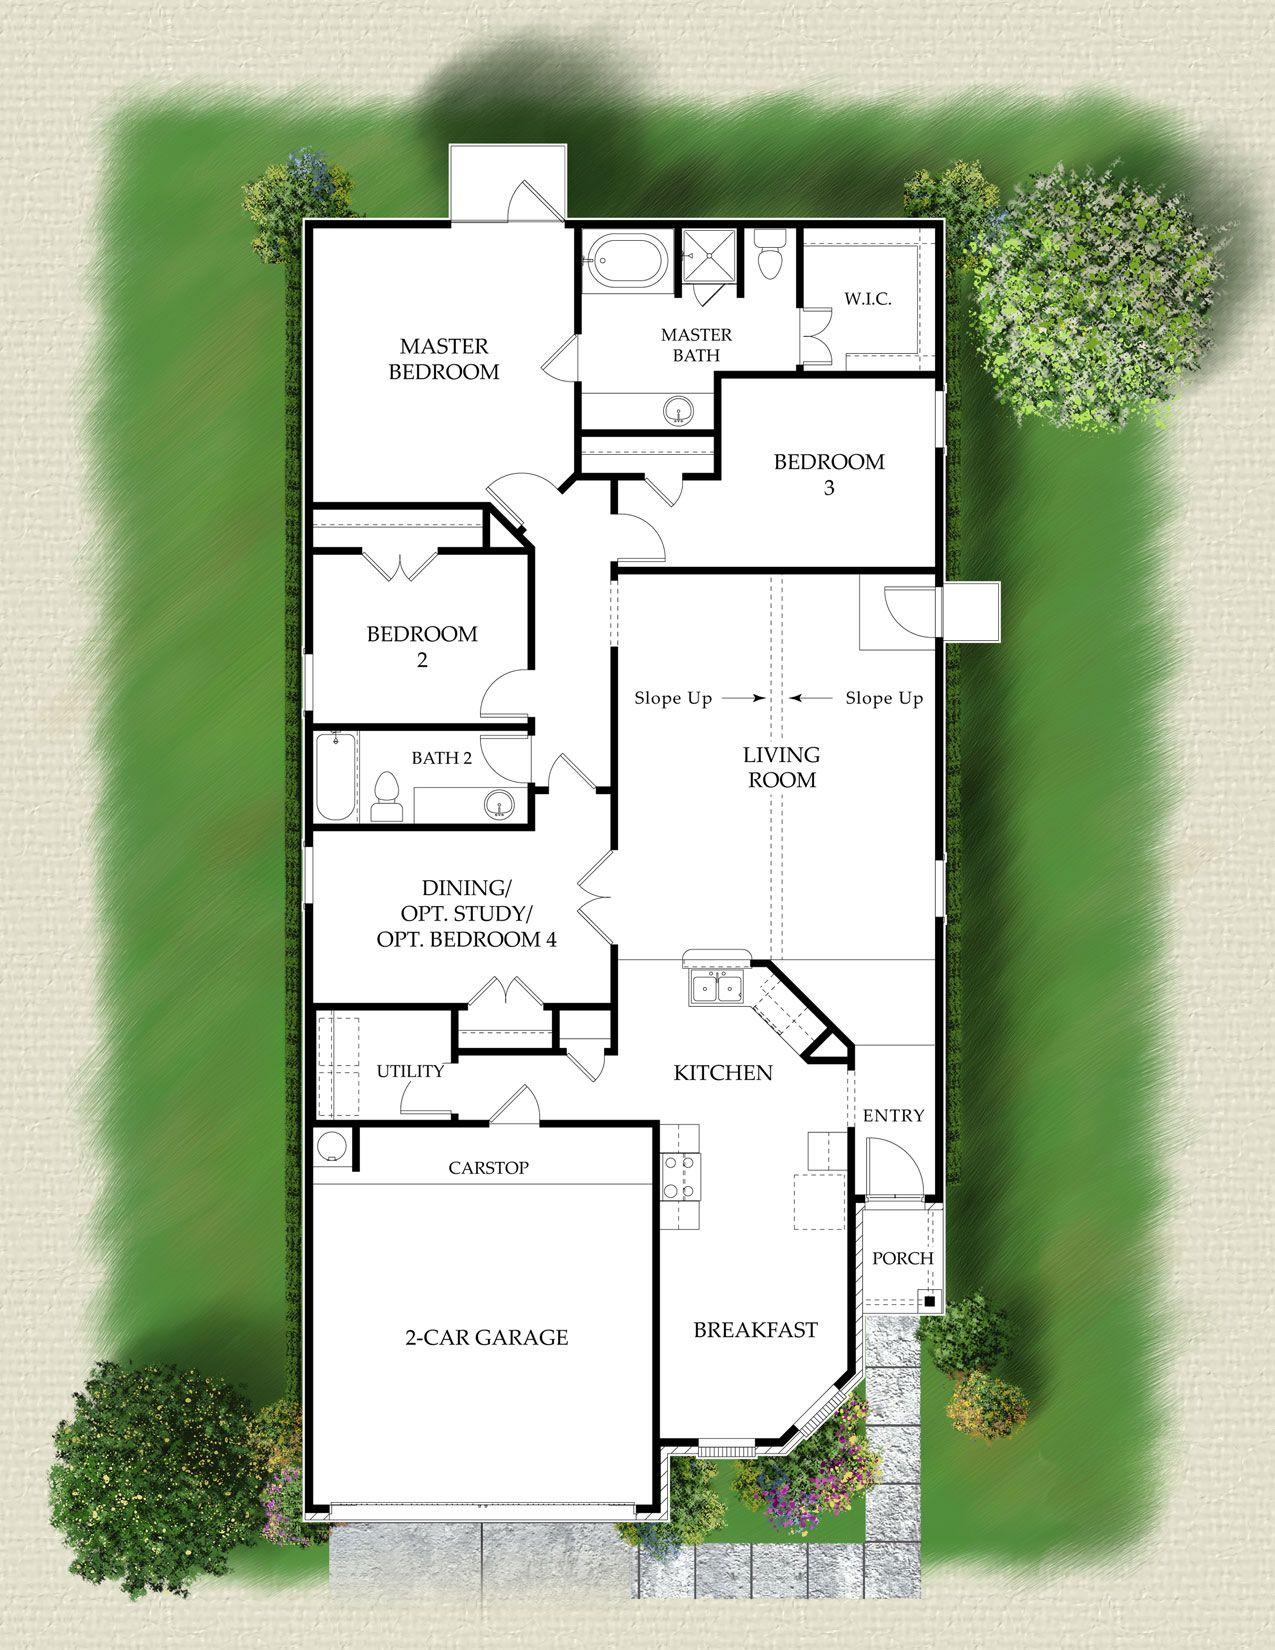 Lgi Homes Floor Plans West Meadows